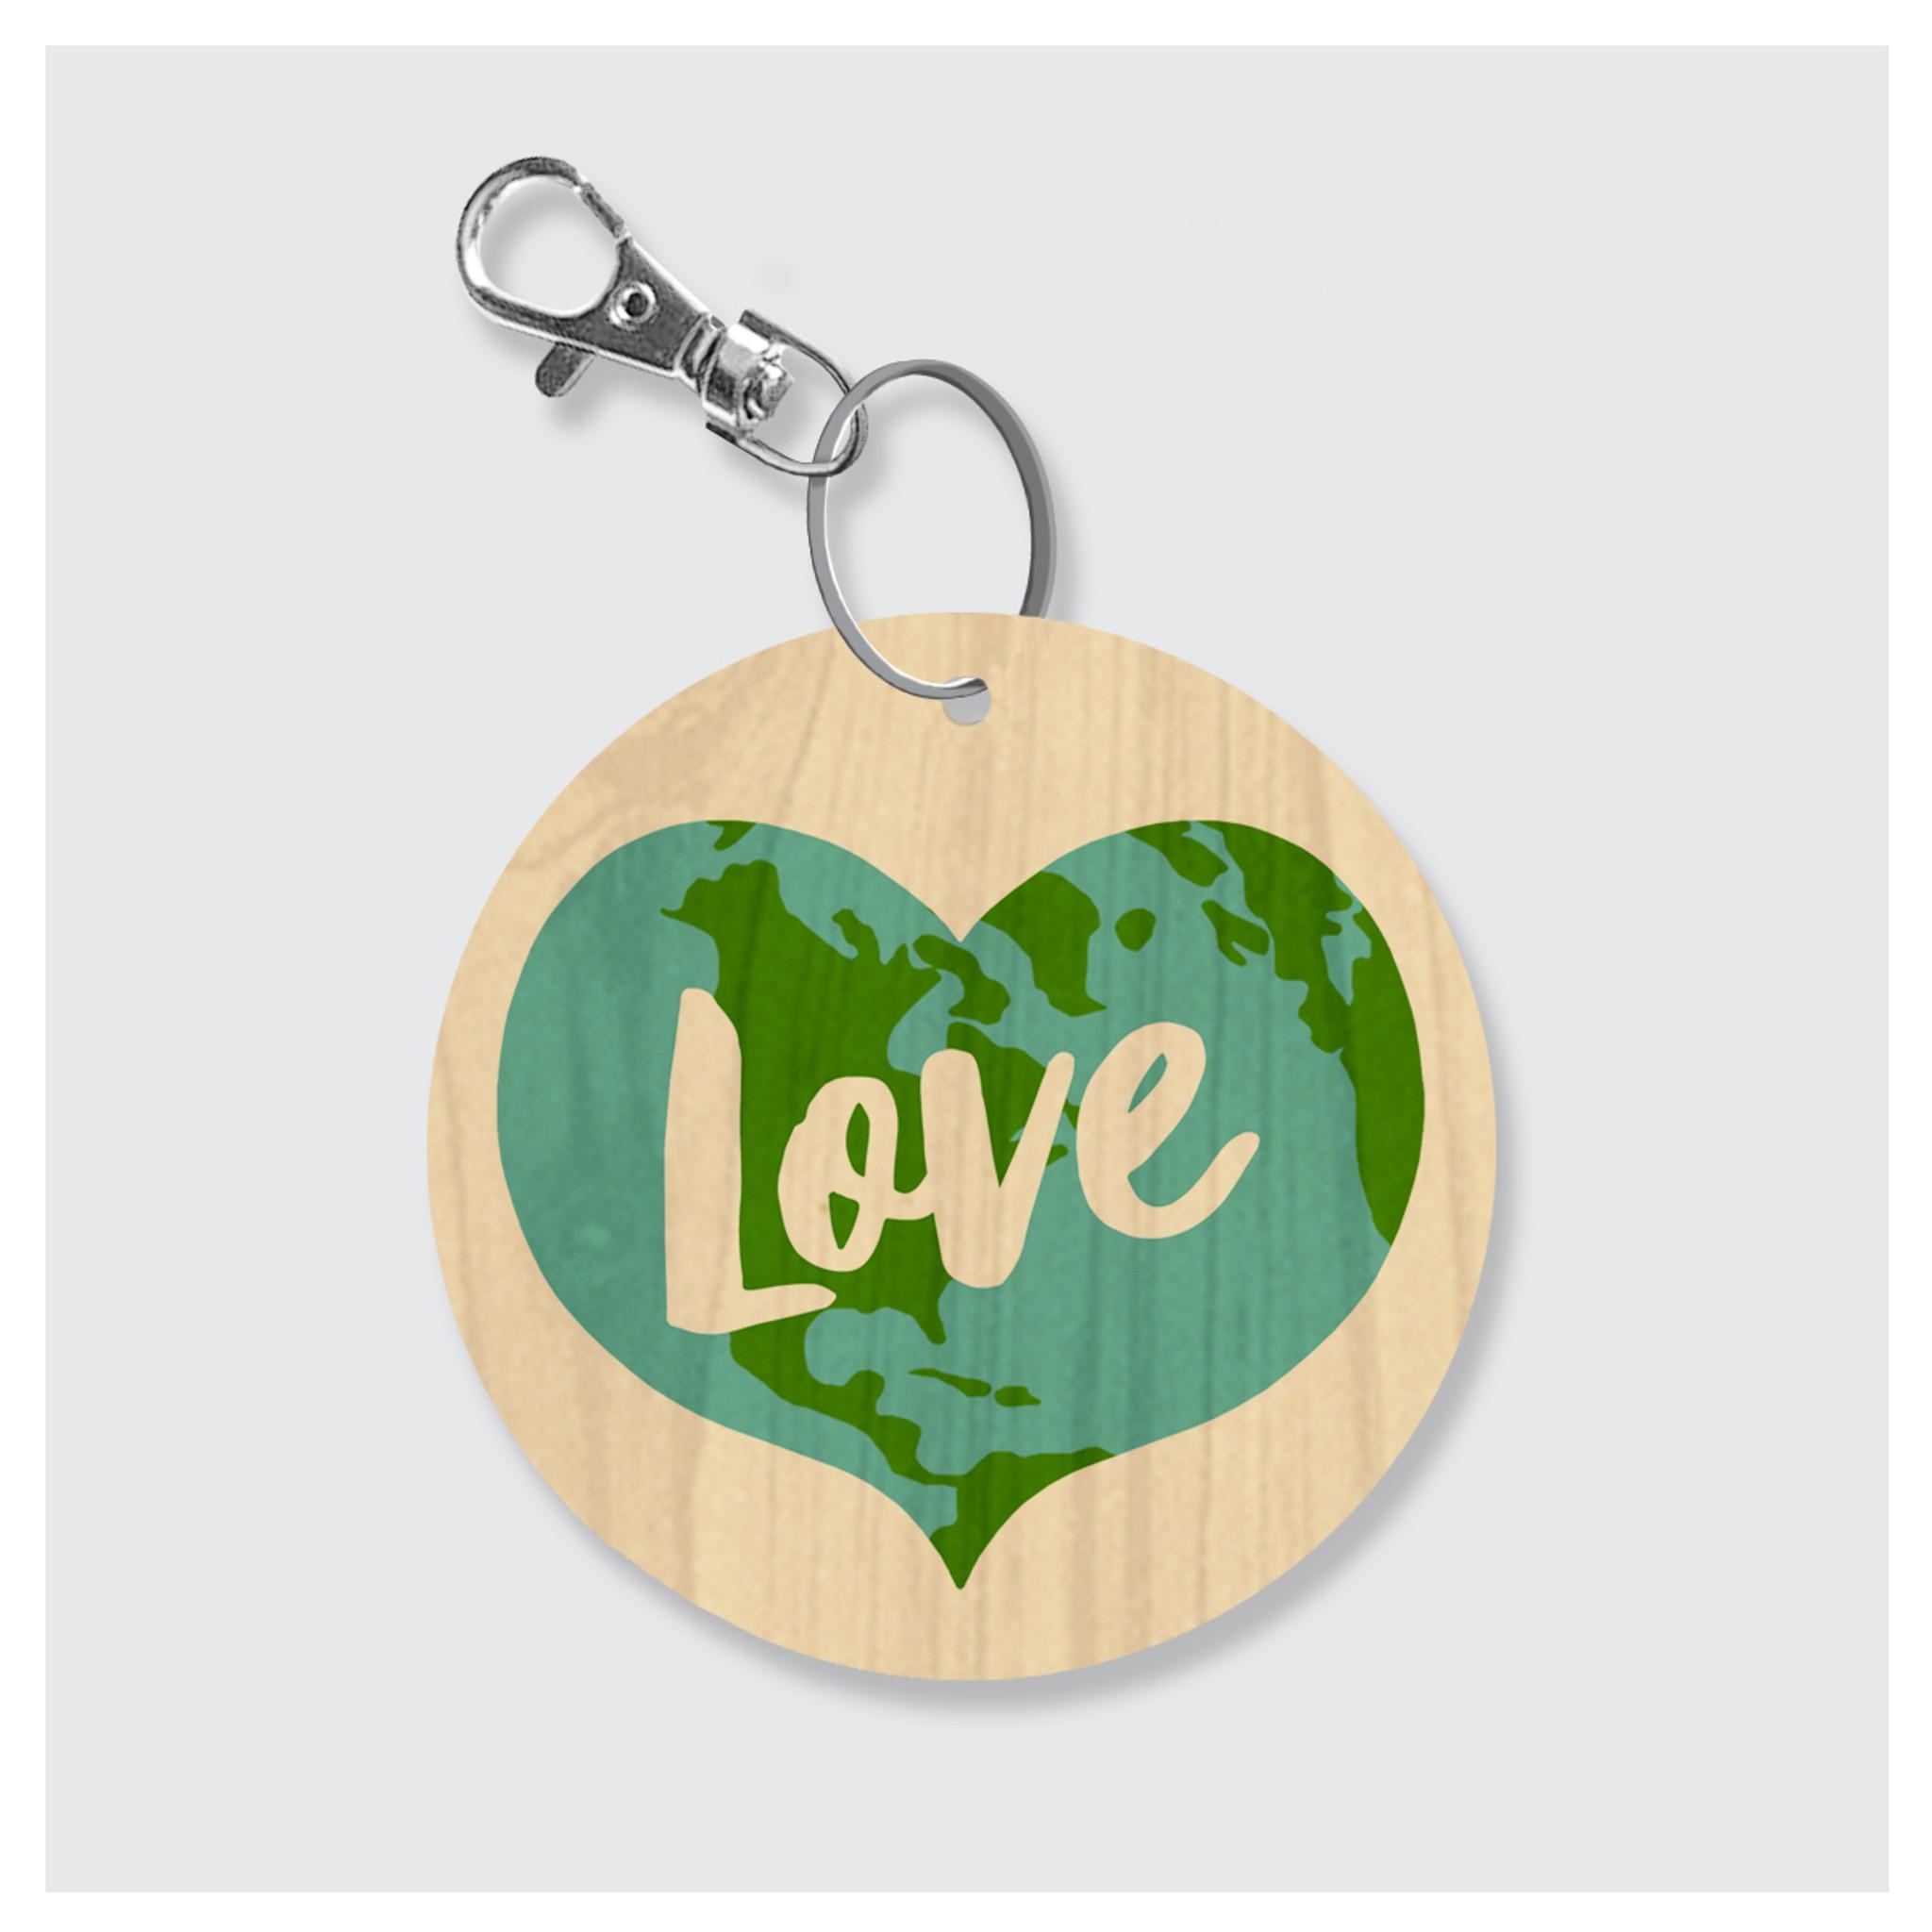 Love Earth Keychain